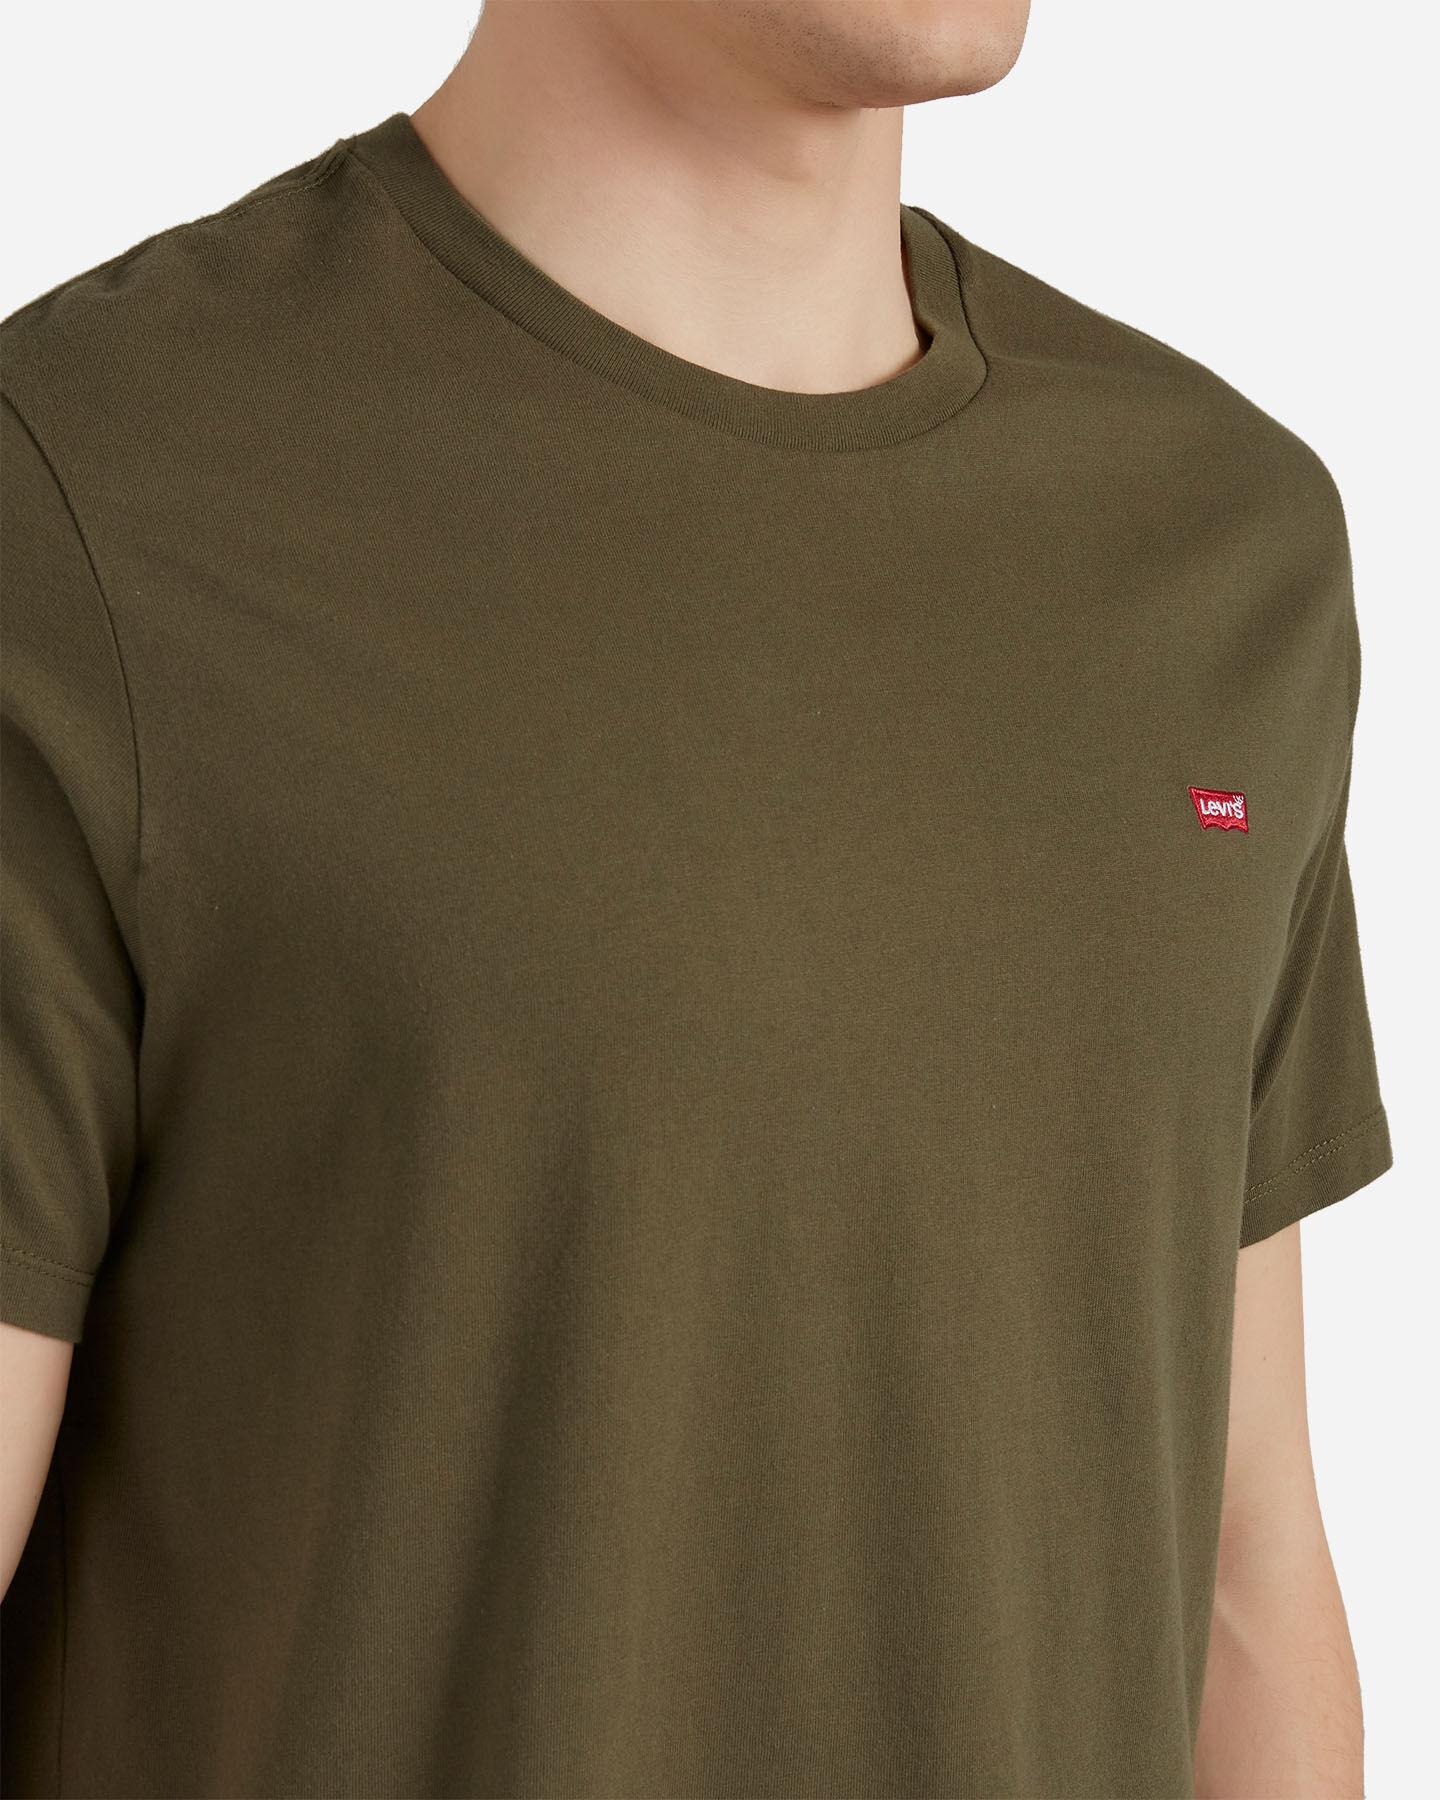 T-Shirt LEVI'S ORIGINAL M S4076919 scatto 4